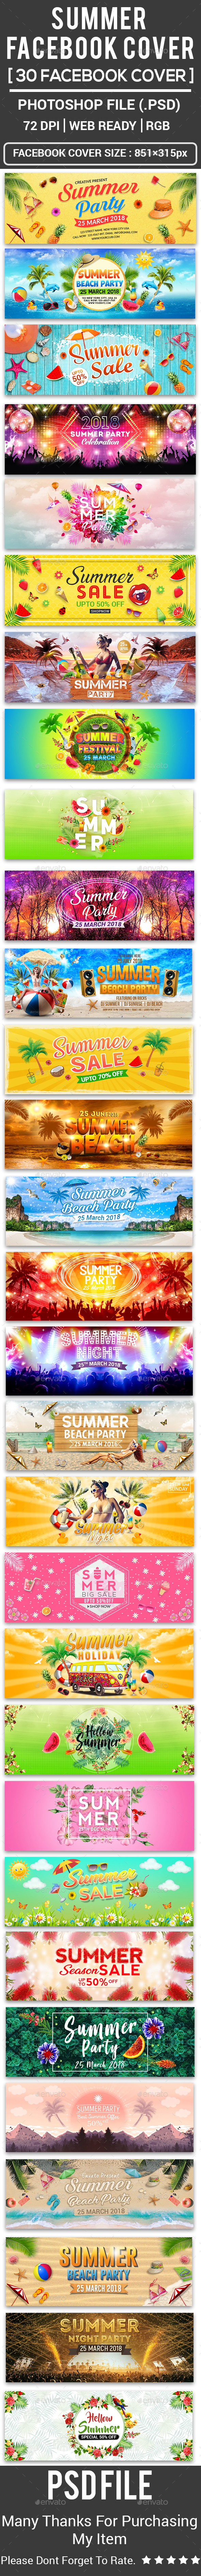 Summer Facebook Cover - Facebook Timeline Covers Social Media